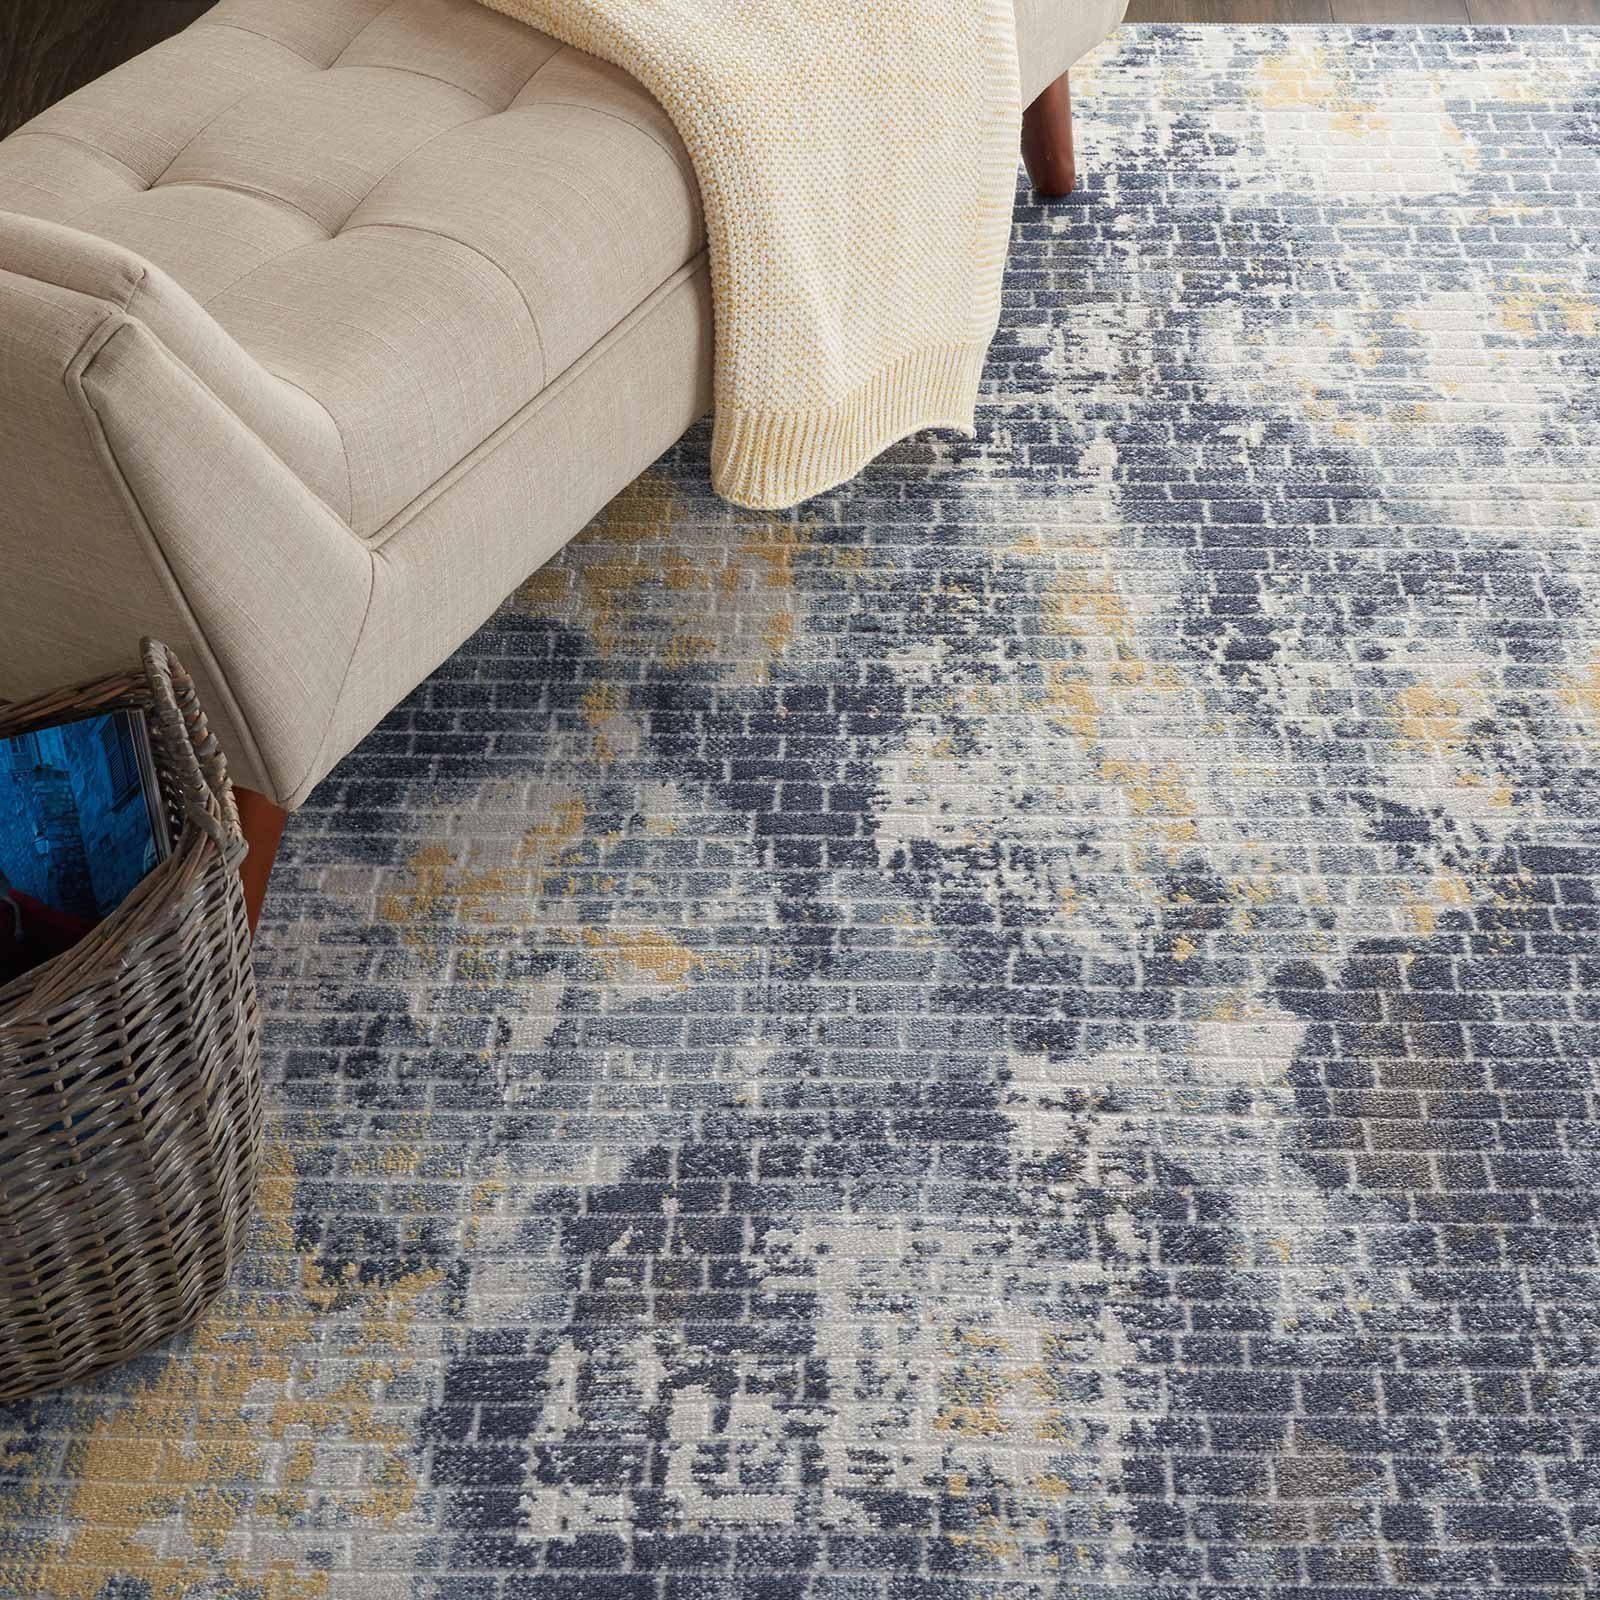 Nourison rug Urban Decor URD05 IVSKY 4x6 099446467171 interior 2 C